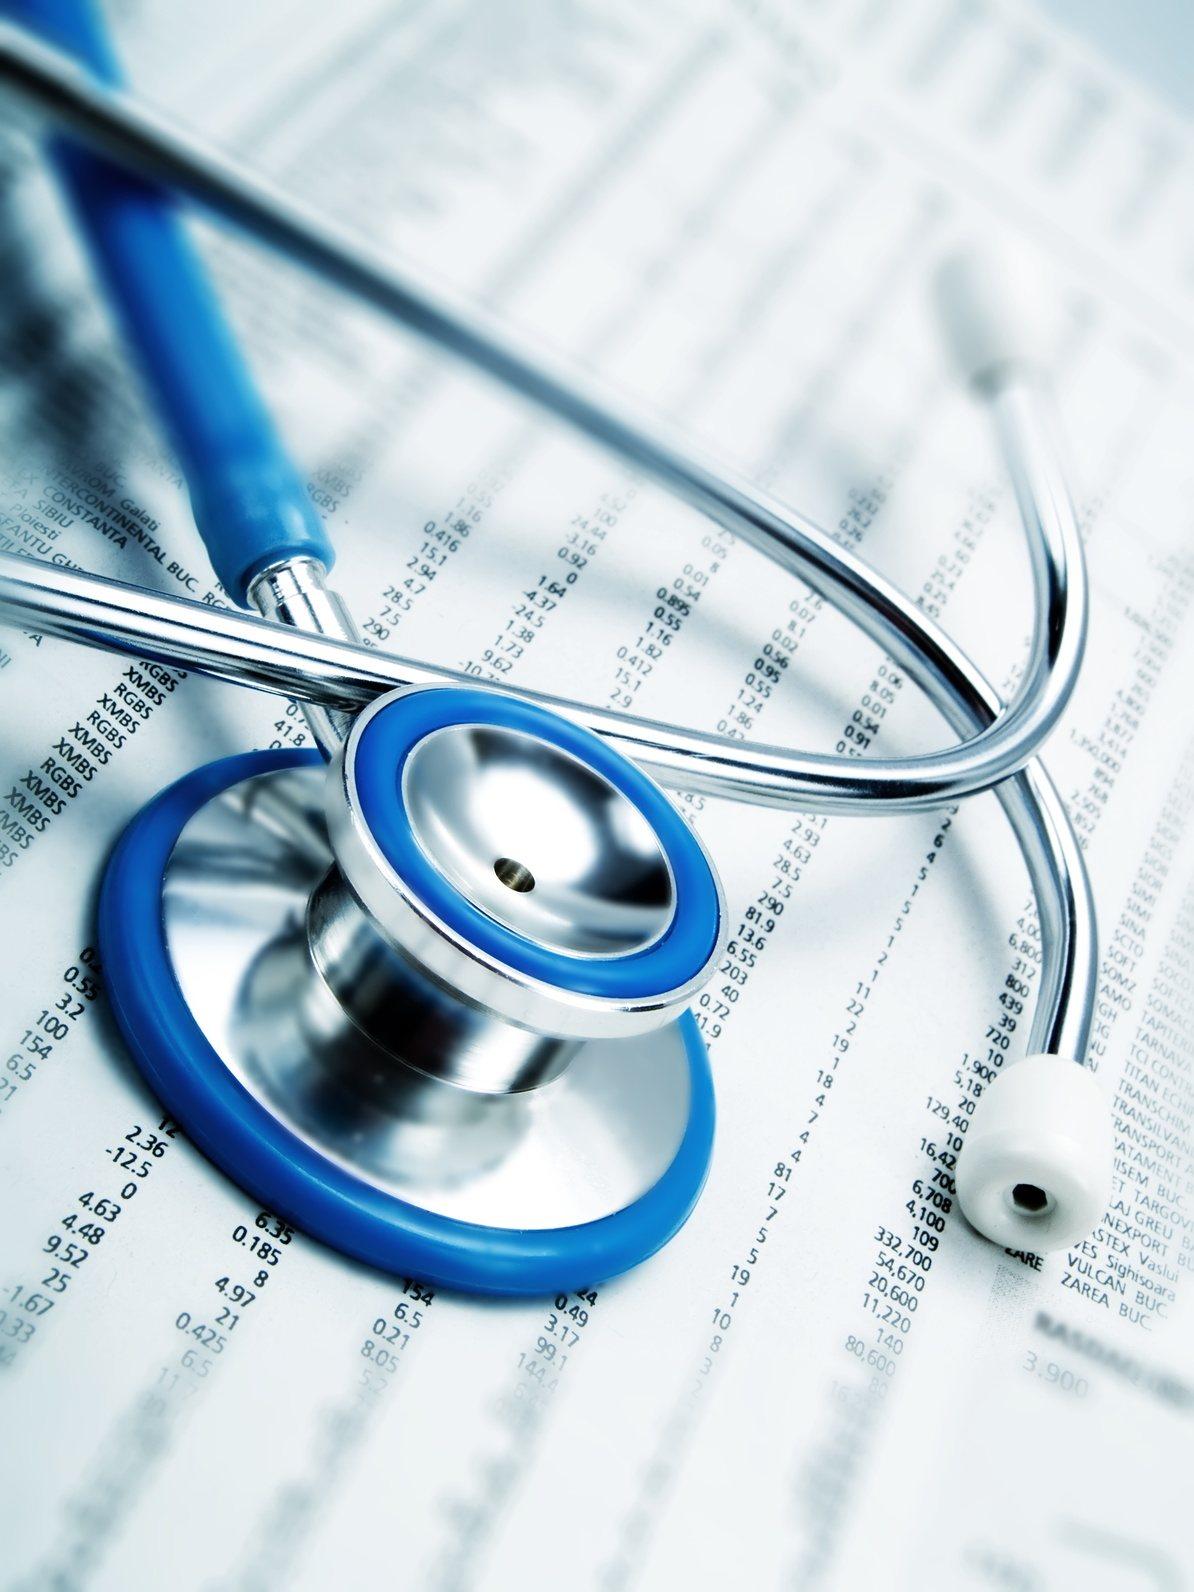 Postpartum Depression Screening ToolsDoctor Stethoscope Images Hd